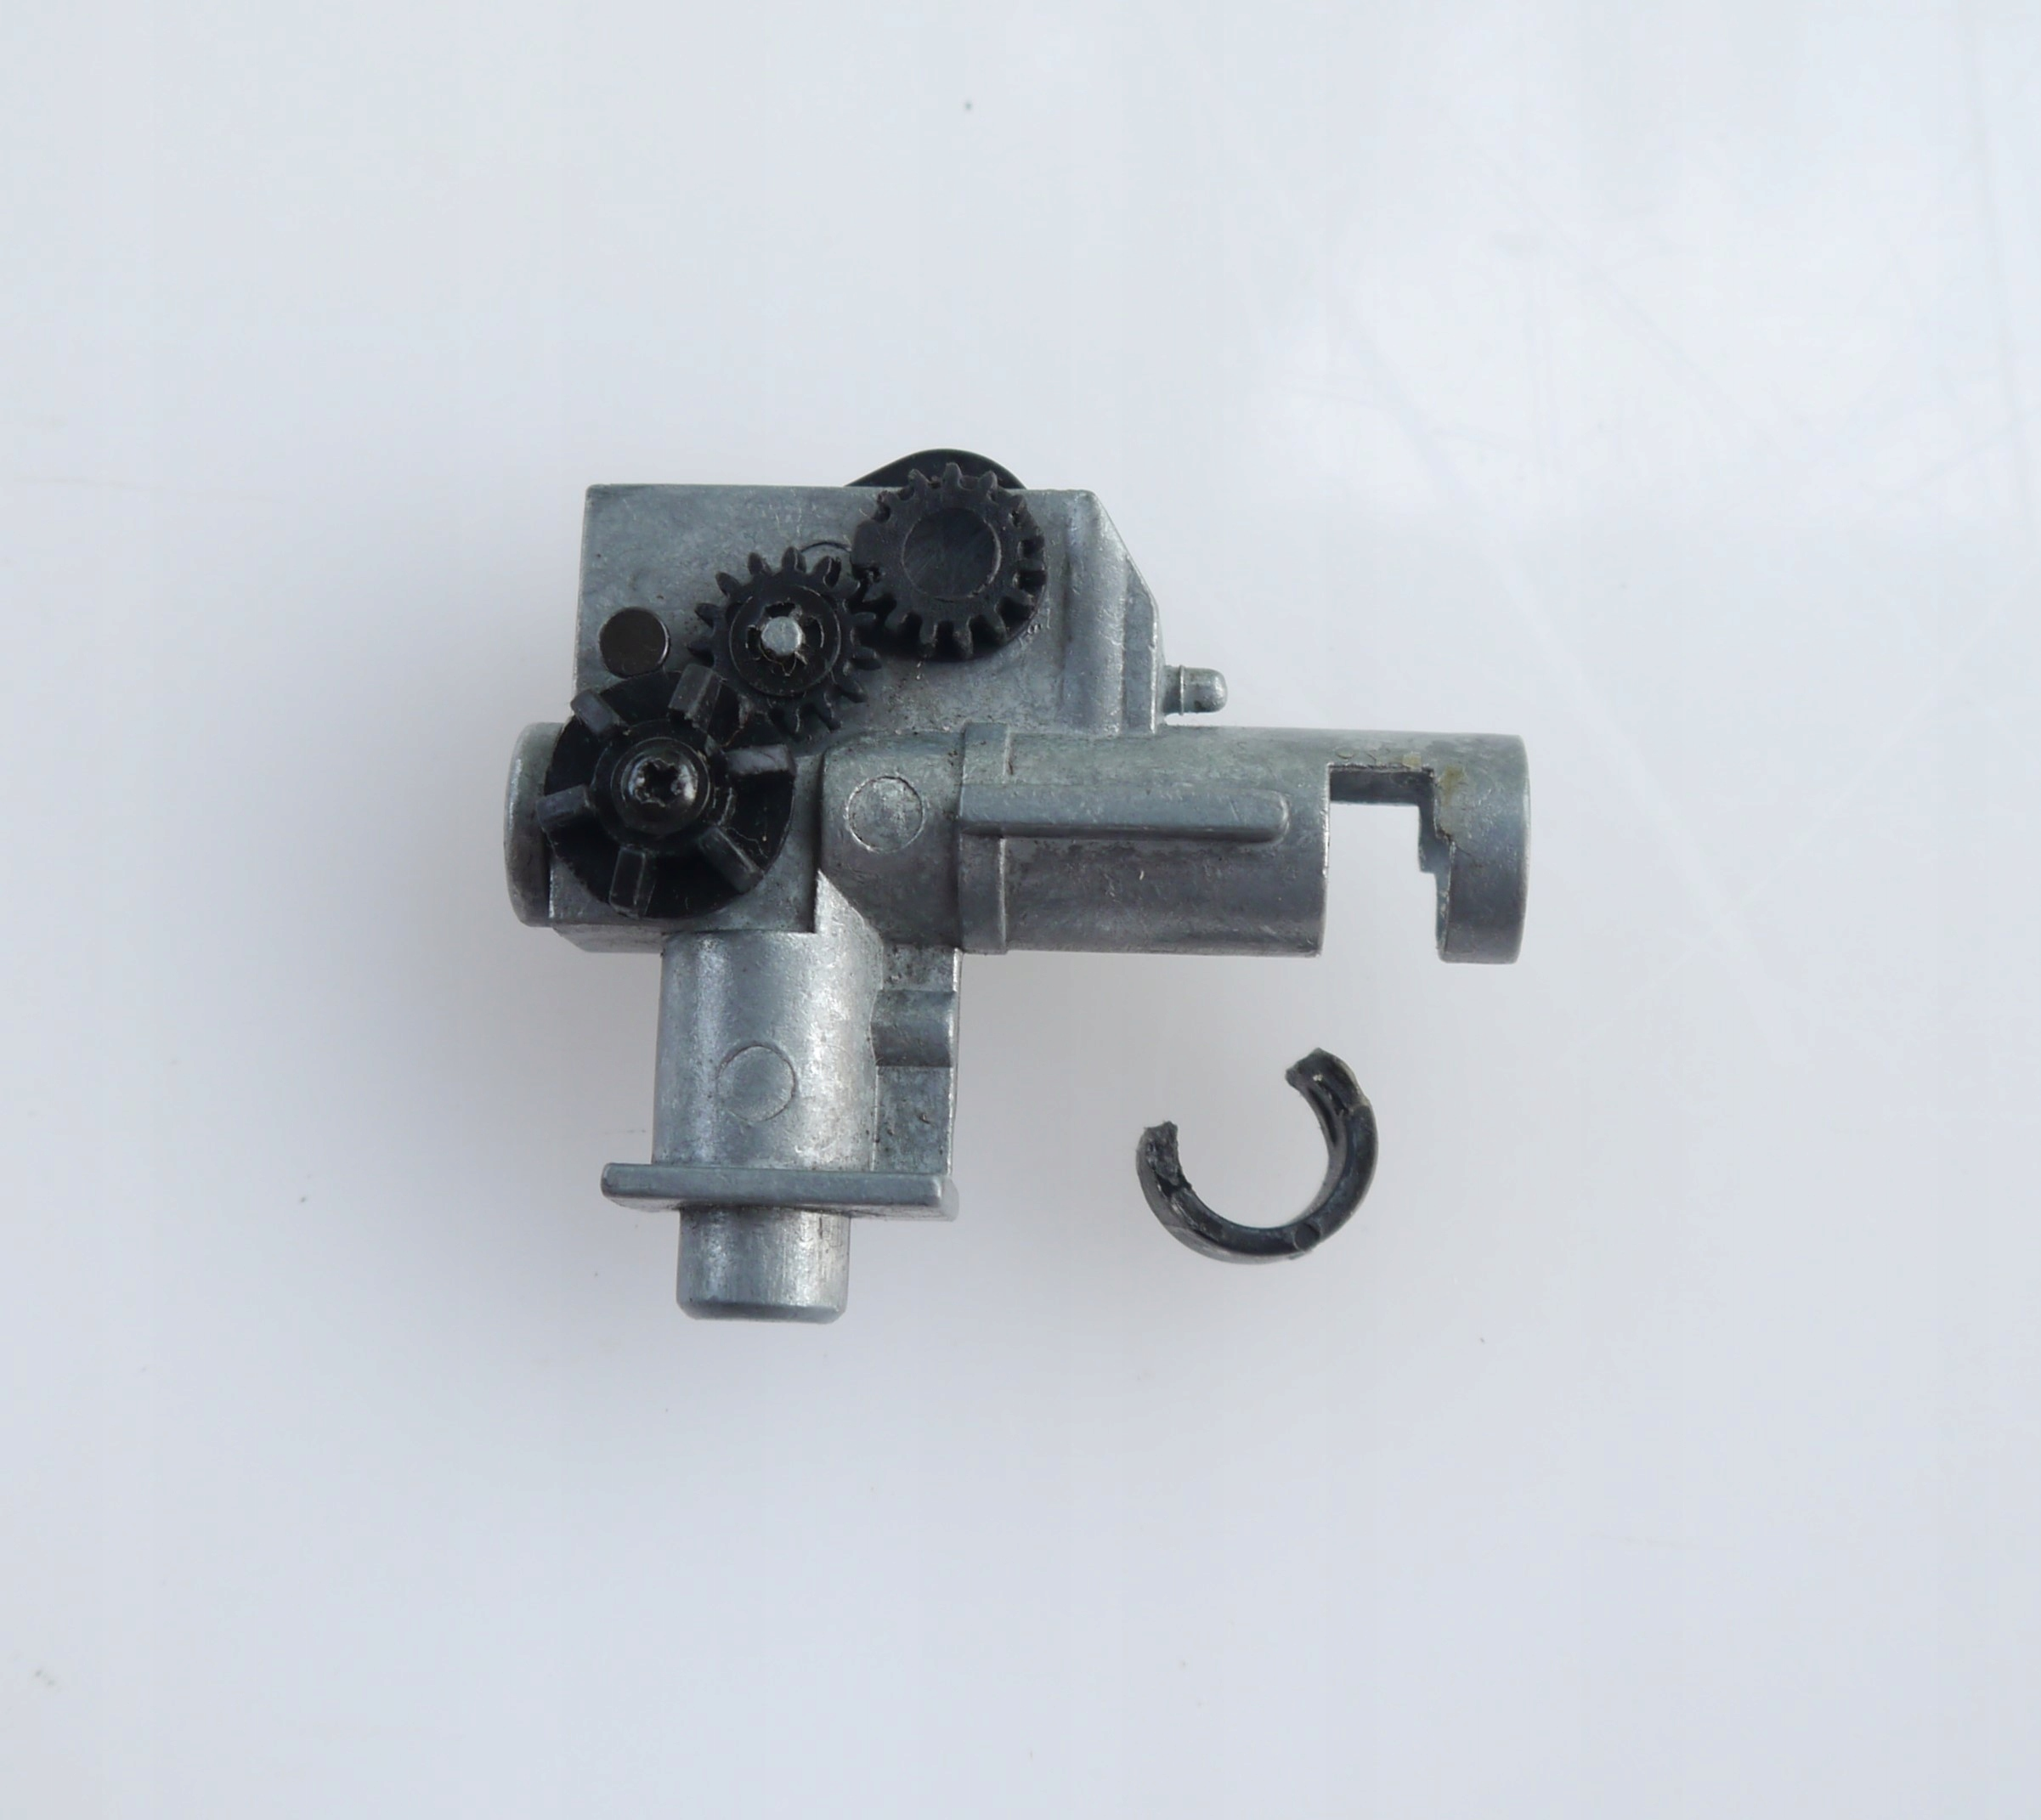 Aluminiowa komora HU M4 A&K ASG